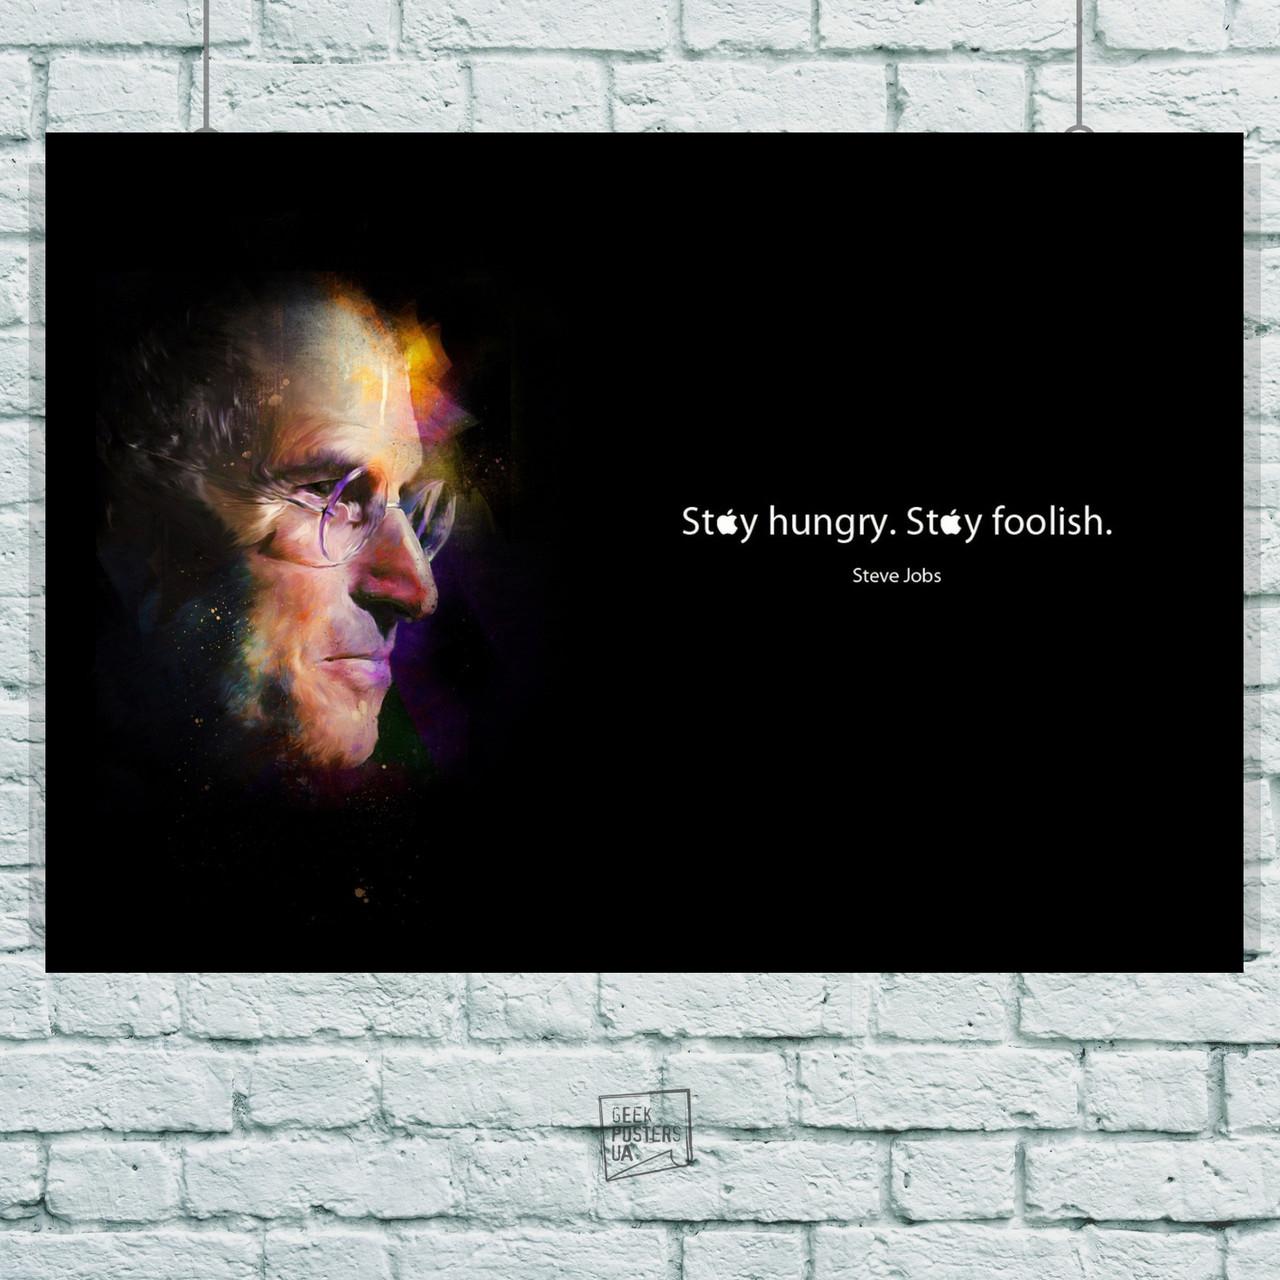 Постер Steve Jobs: Stay hungry, stay foolish. Размер 60x42см (A2). Глянцевая бумага